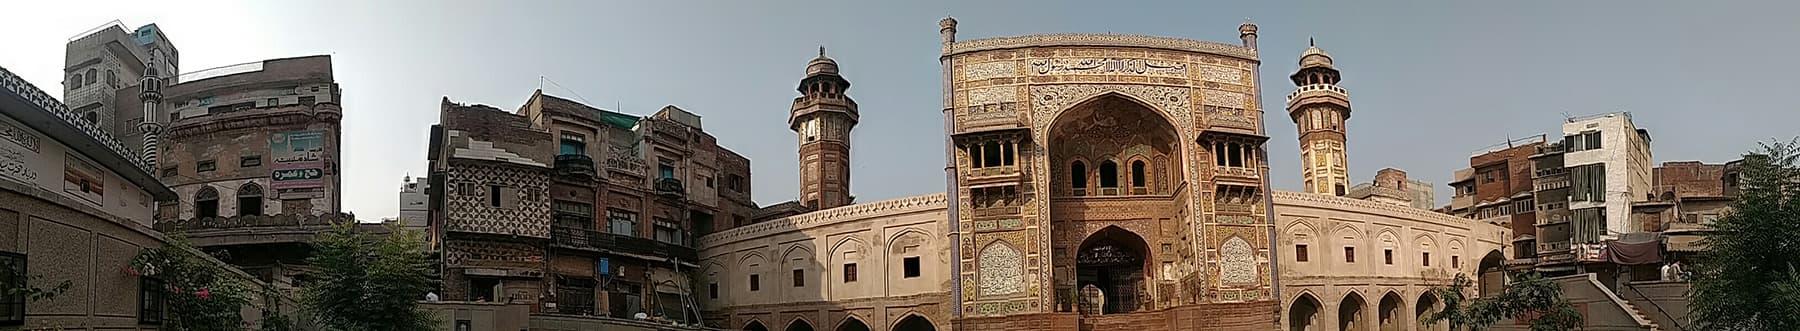 مسجد وزیر خان لاہور پینوراما—تصویر عبیداللہ کیہر